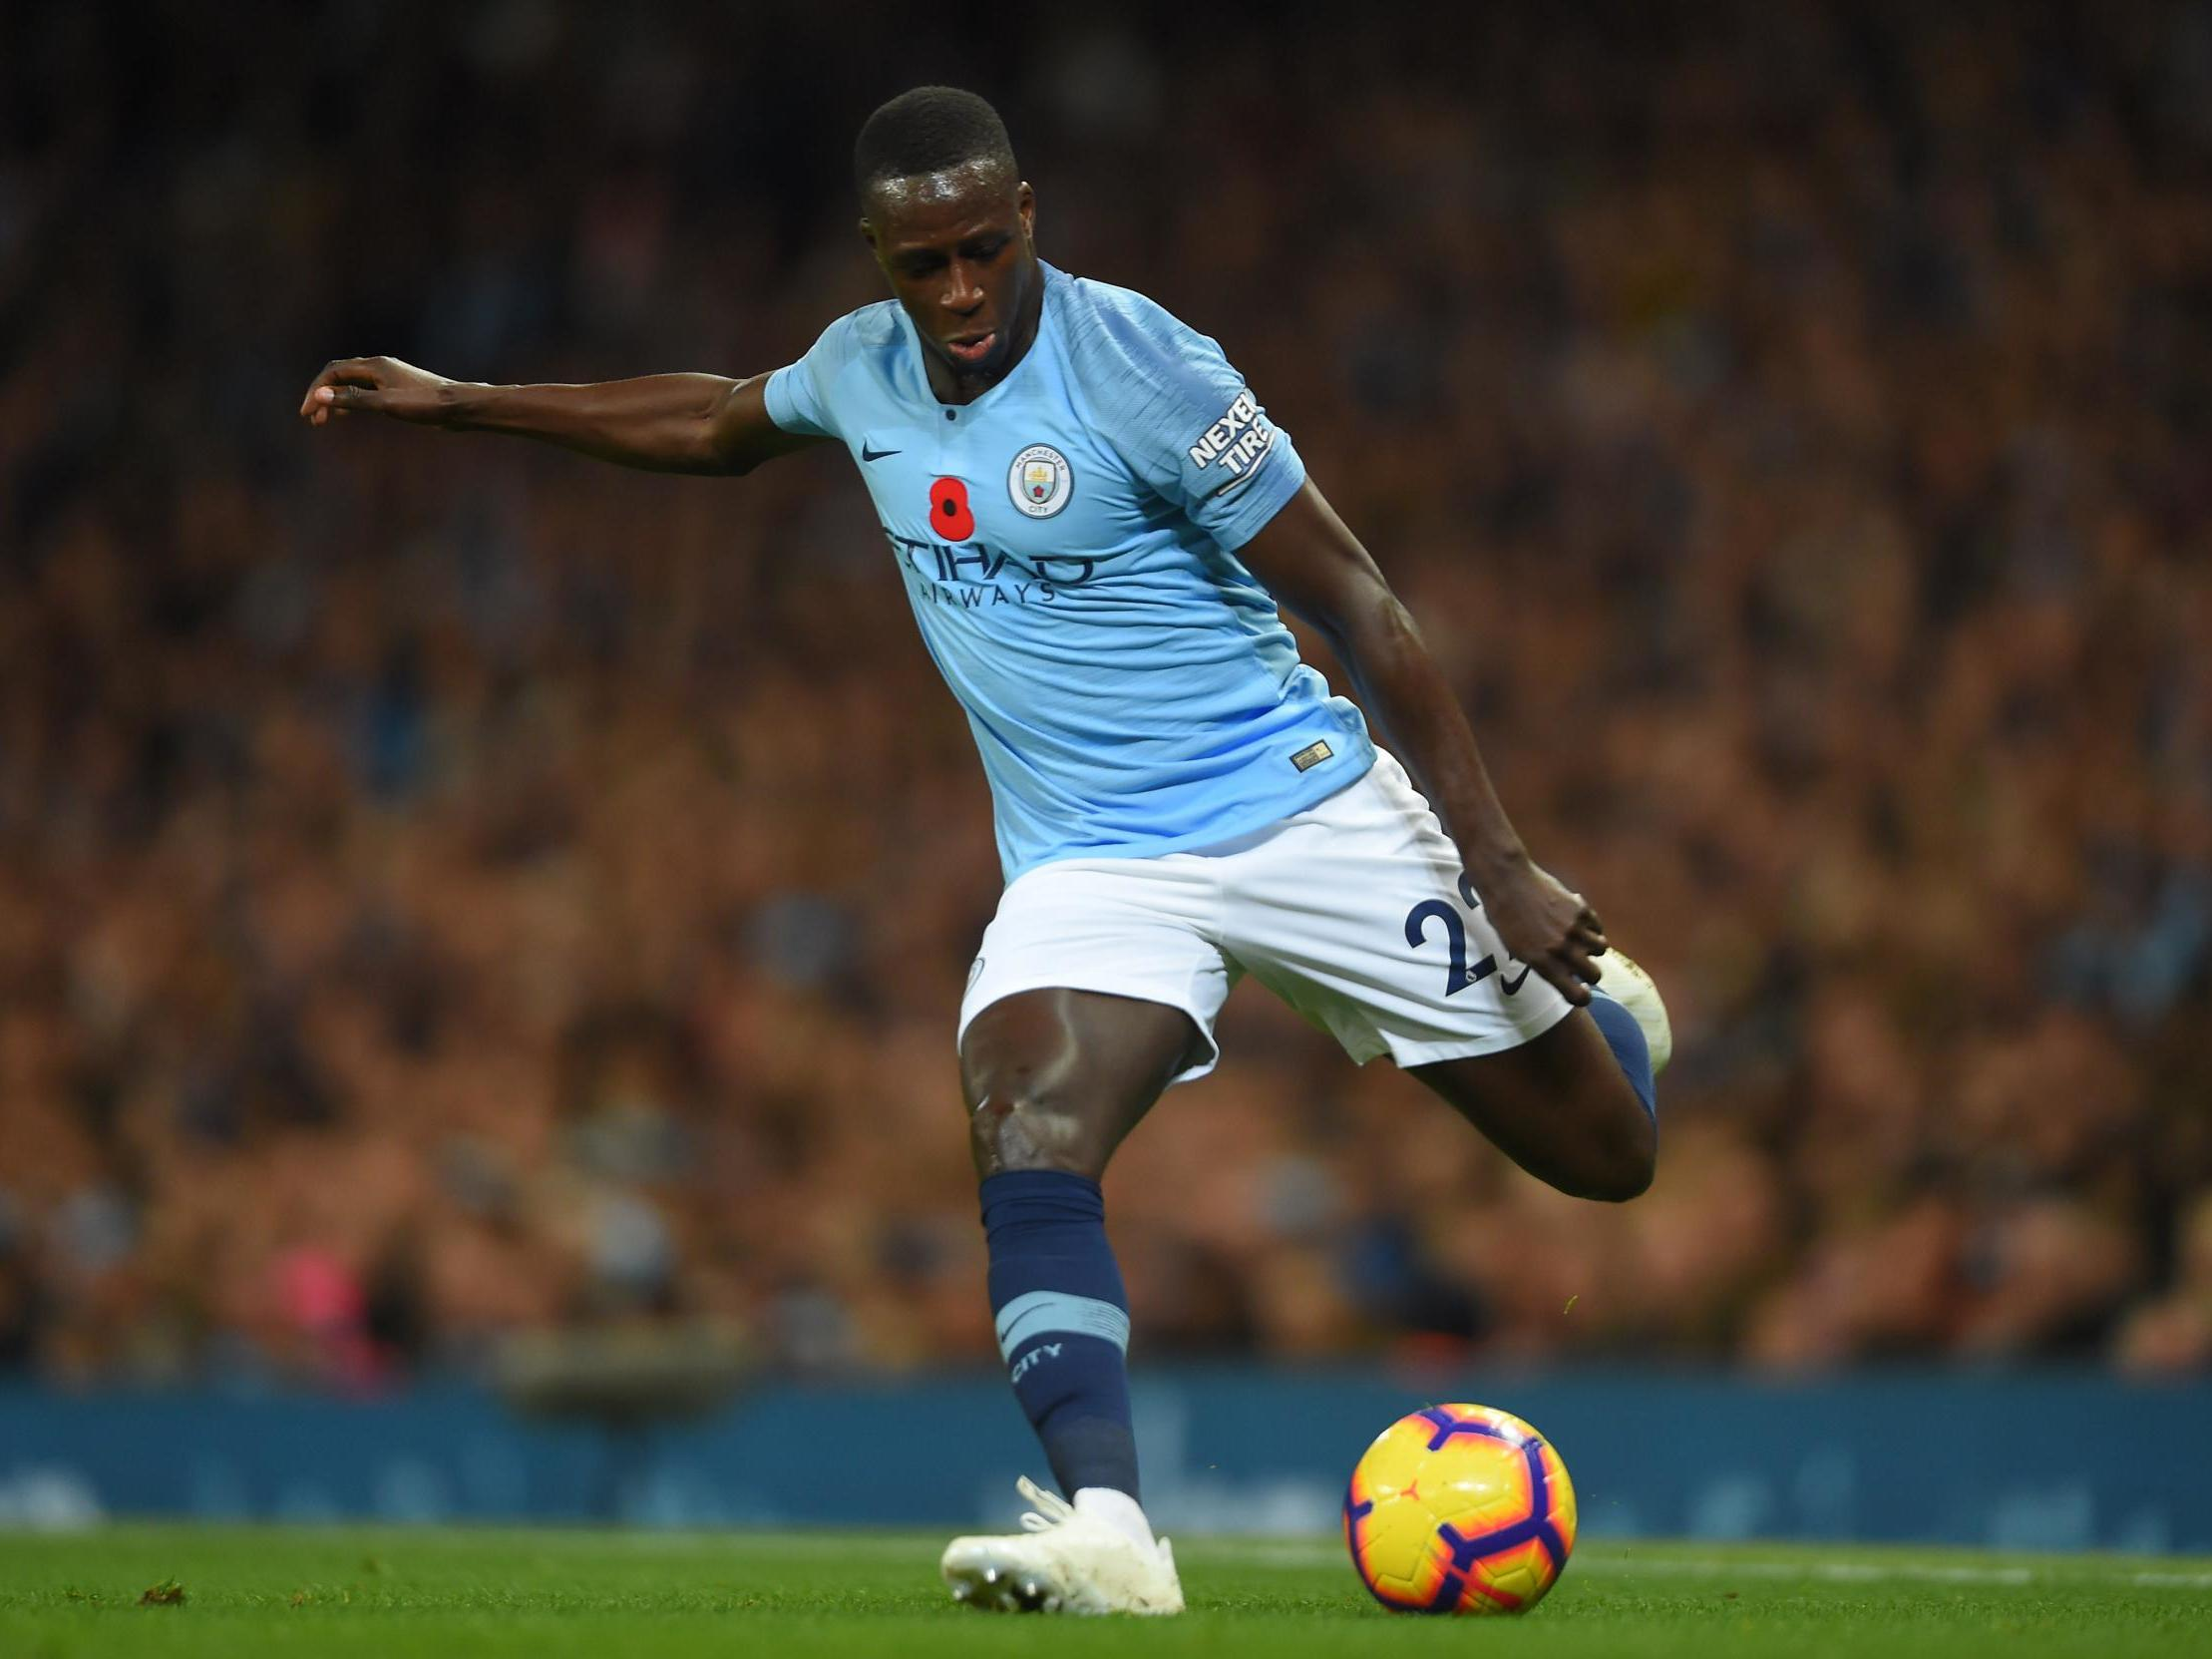 Pep Guardiola wants Benjamin Mendy to reach full potential at Manchester City